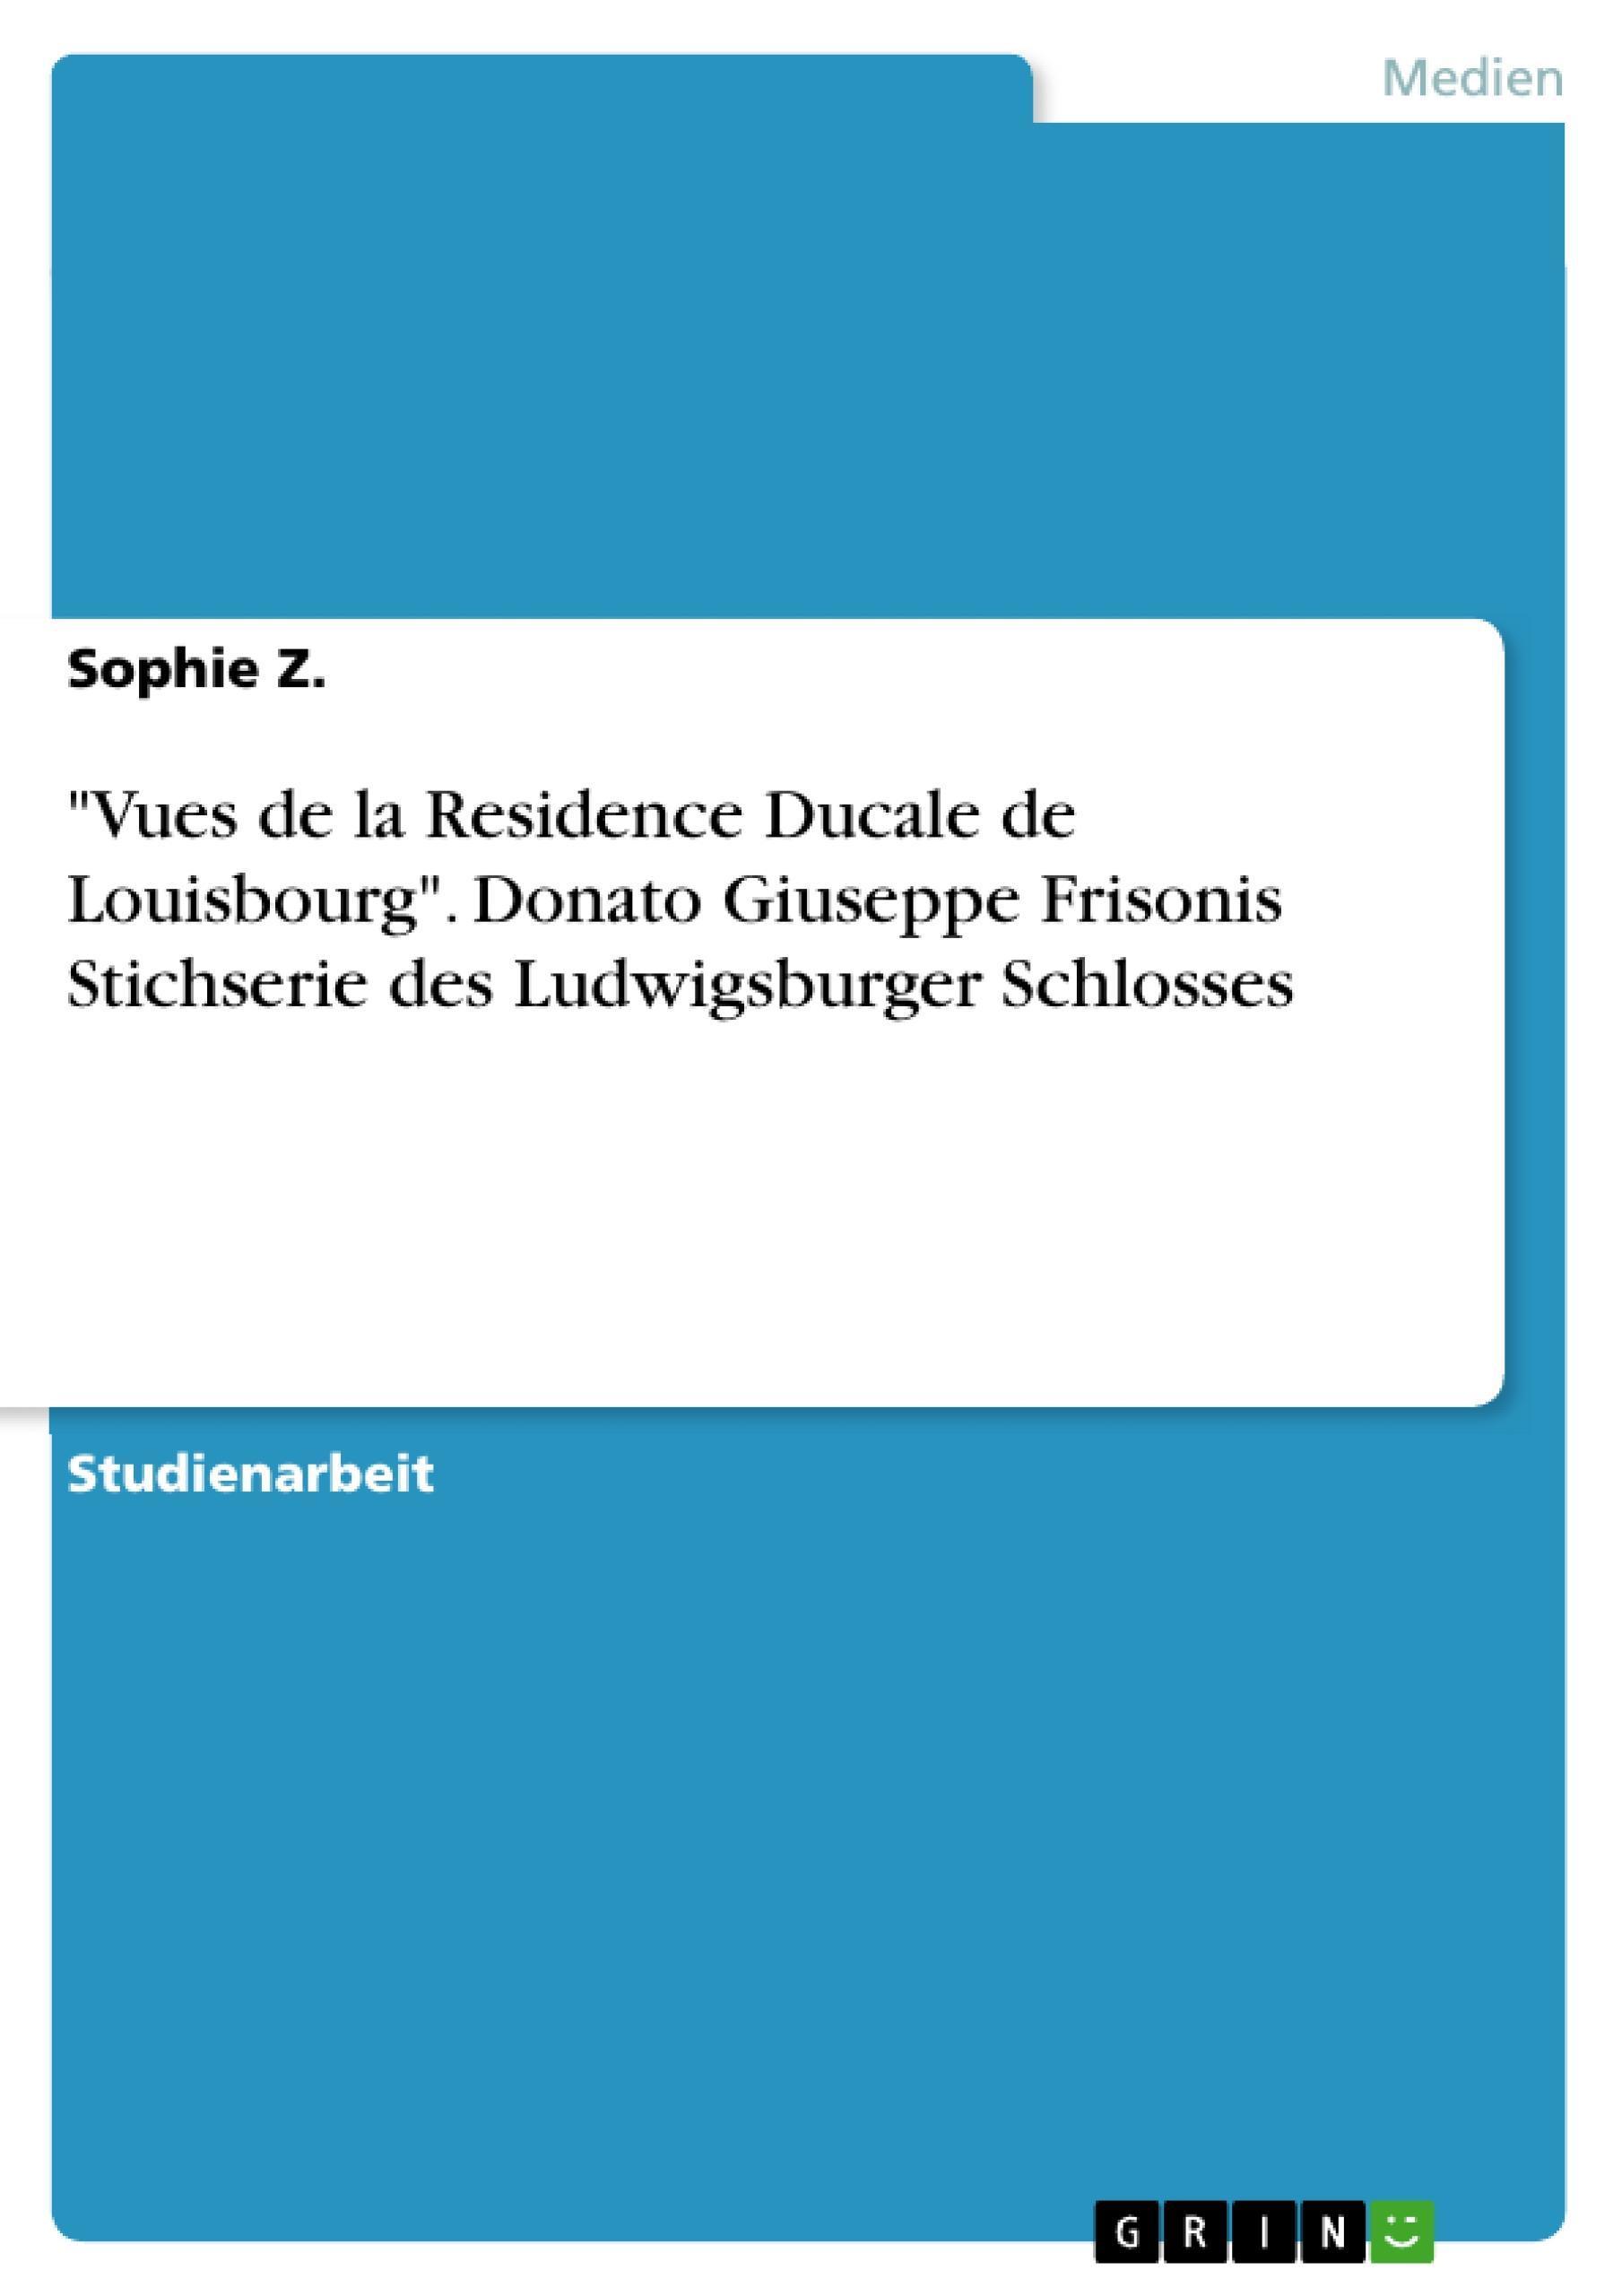 """""Vues de la Residence Ducale de Louisbourg"""". Donato Giuseppe Frisonis Sti ..."